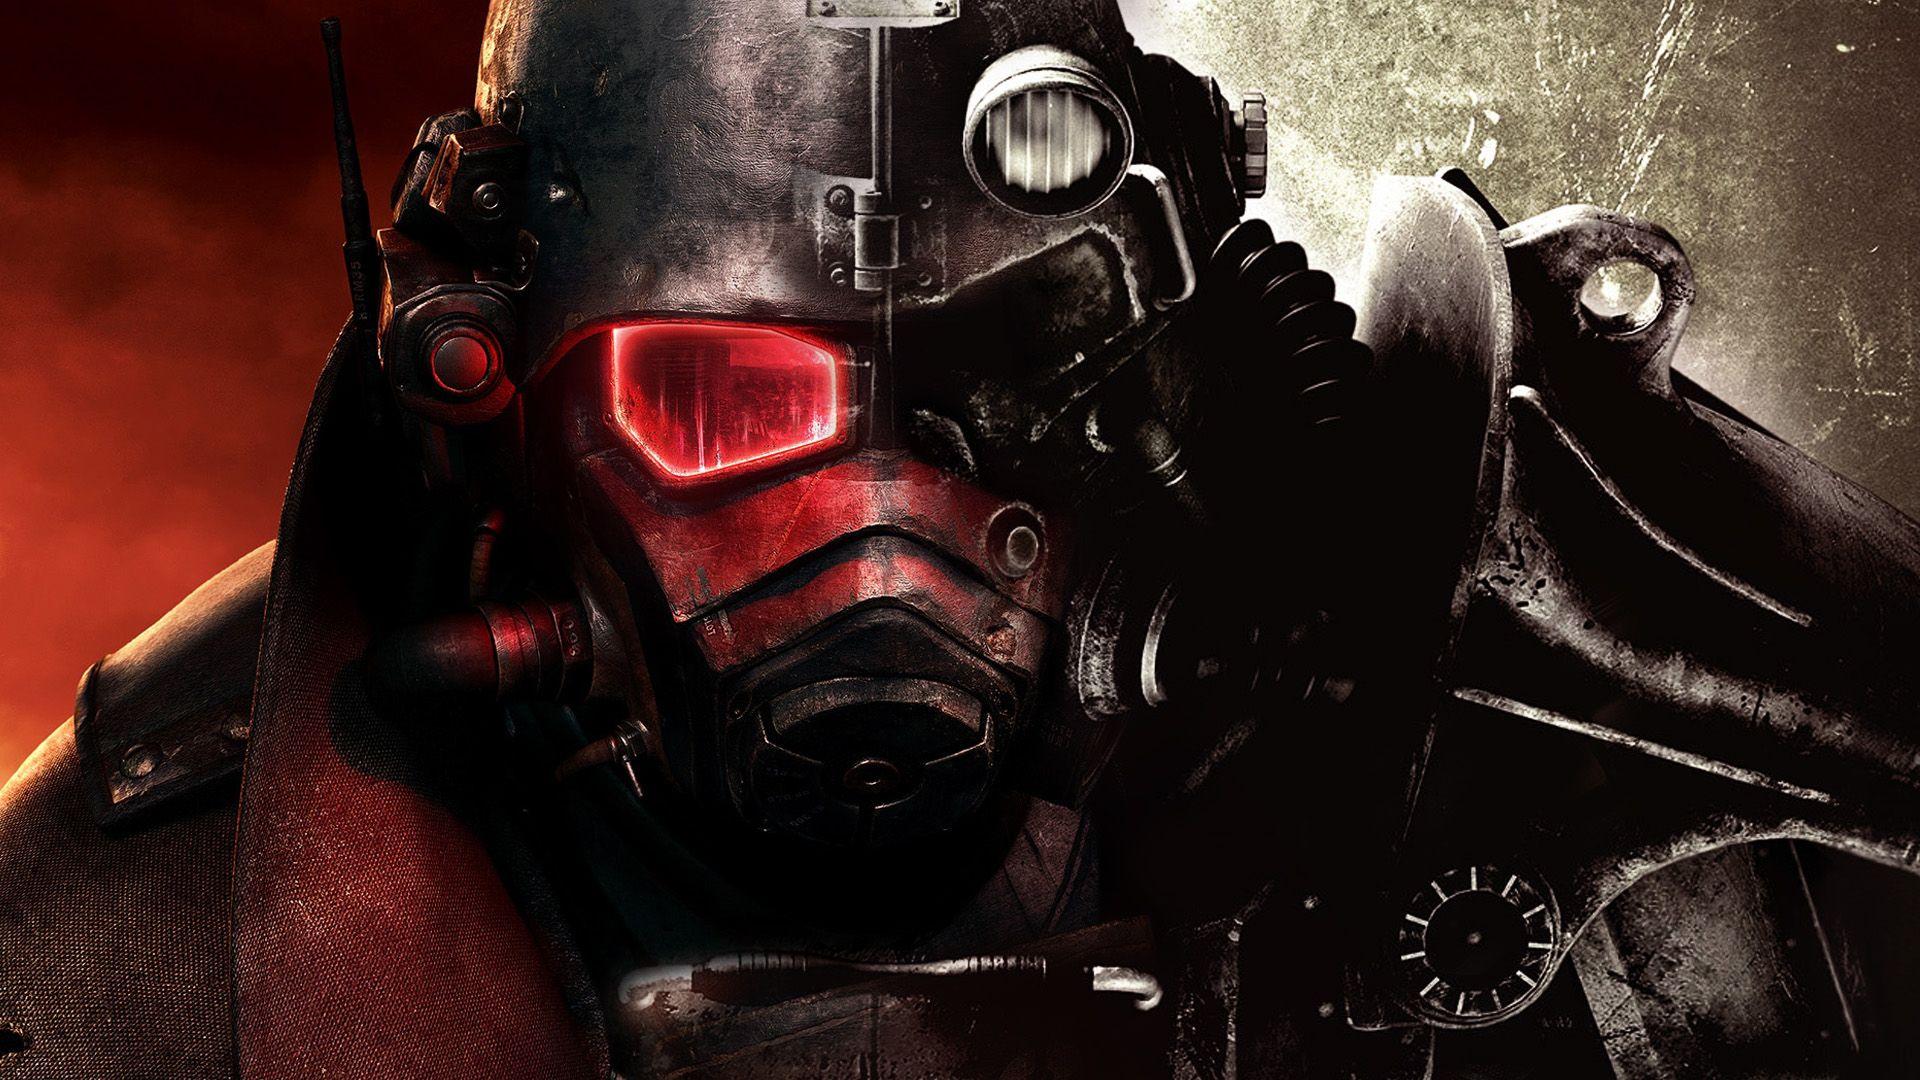 Fallout Desktop Wallpaper 07.10.2020 · ryoma hoshi gallery. hd 4k wallpapers for desktop mobiles